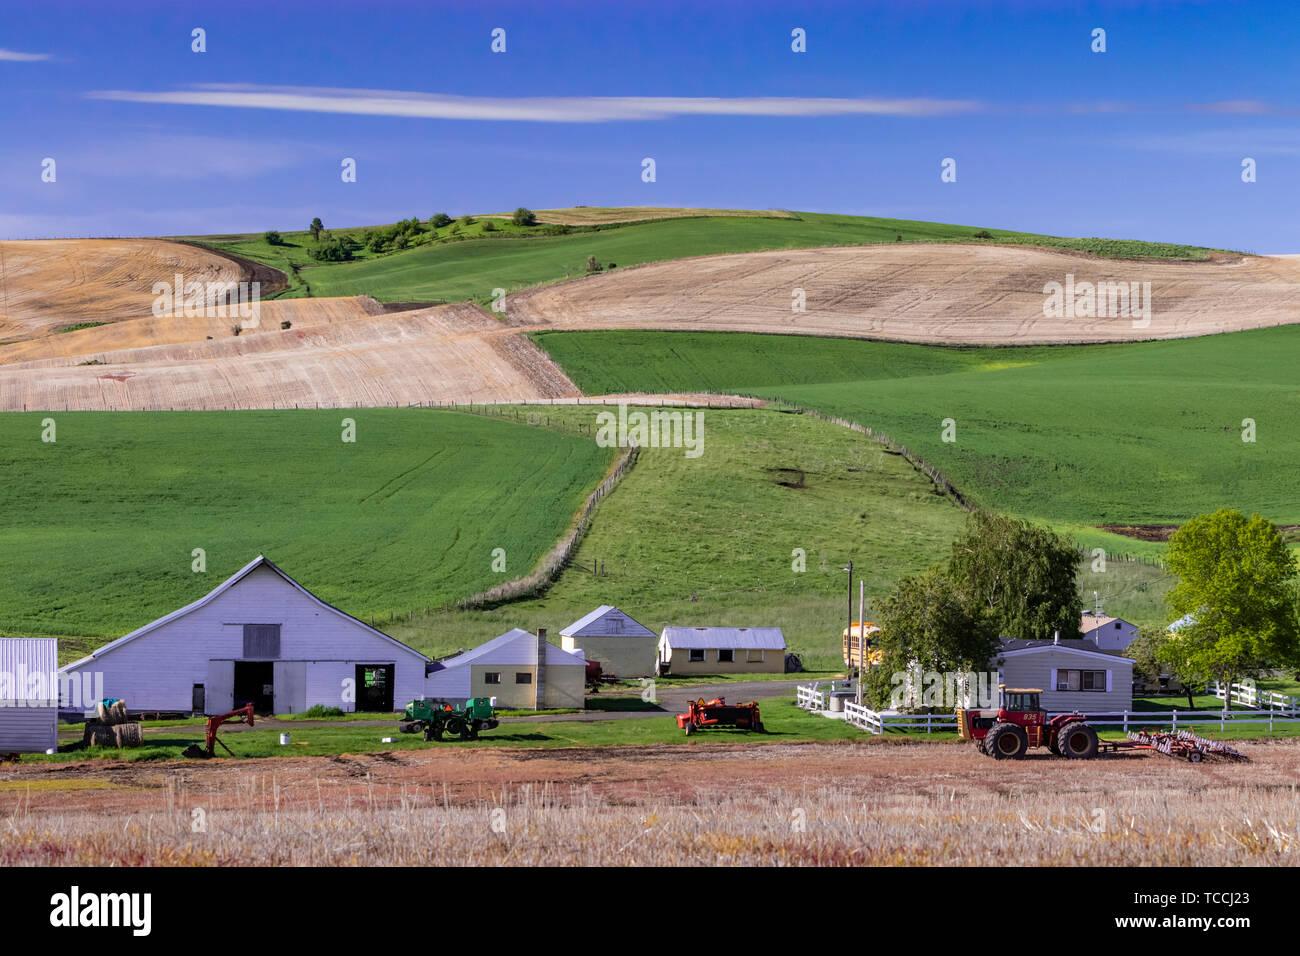 Farm buildings in the rolling hills near Grangeville, Idaho, USA. - Stock Image